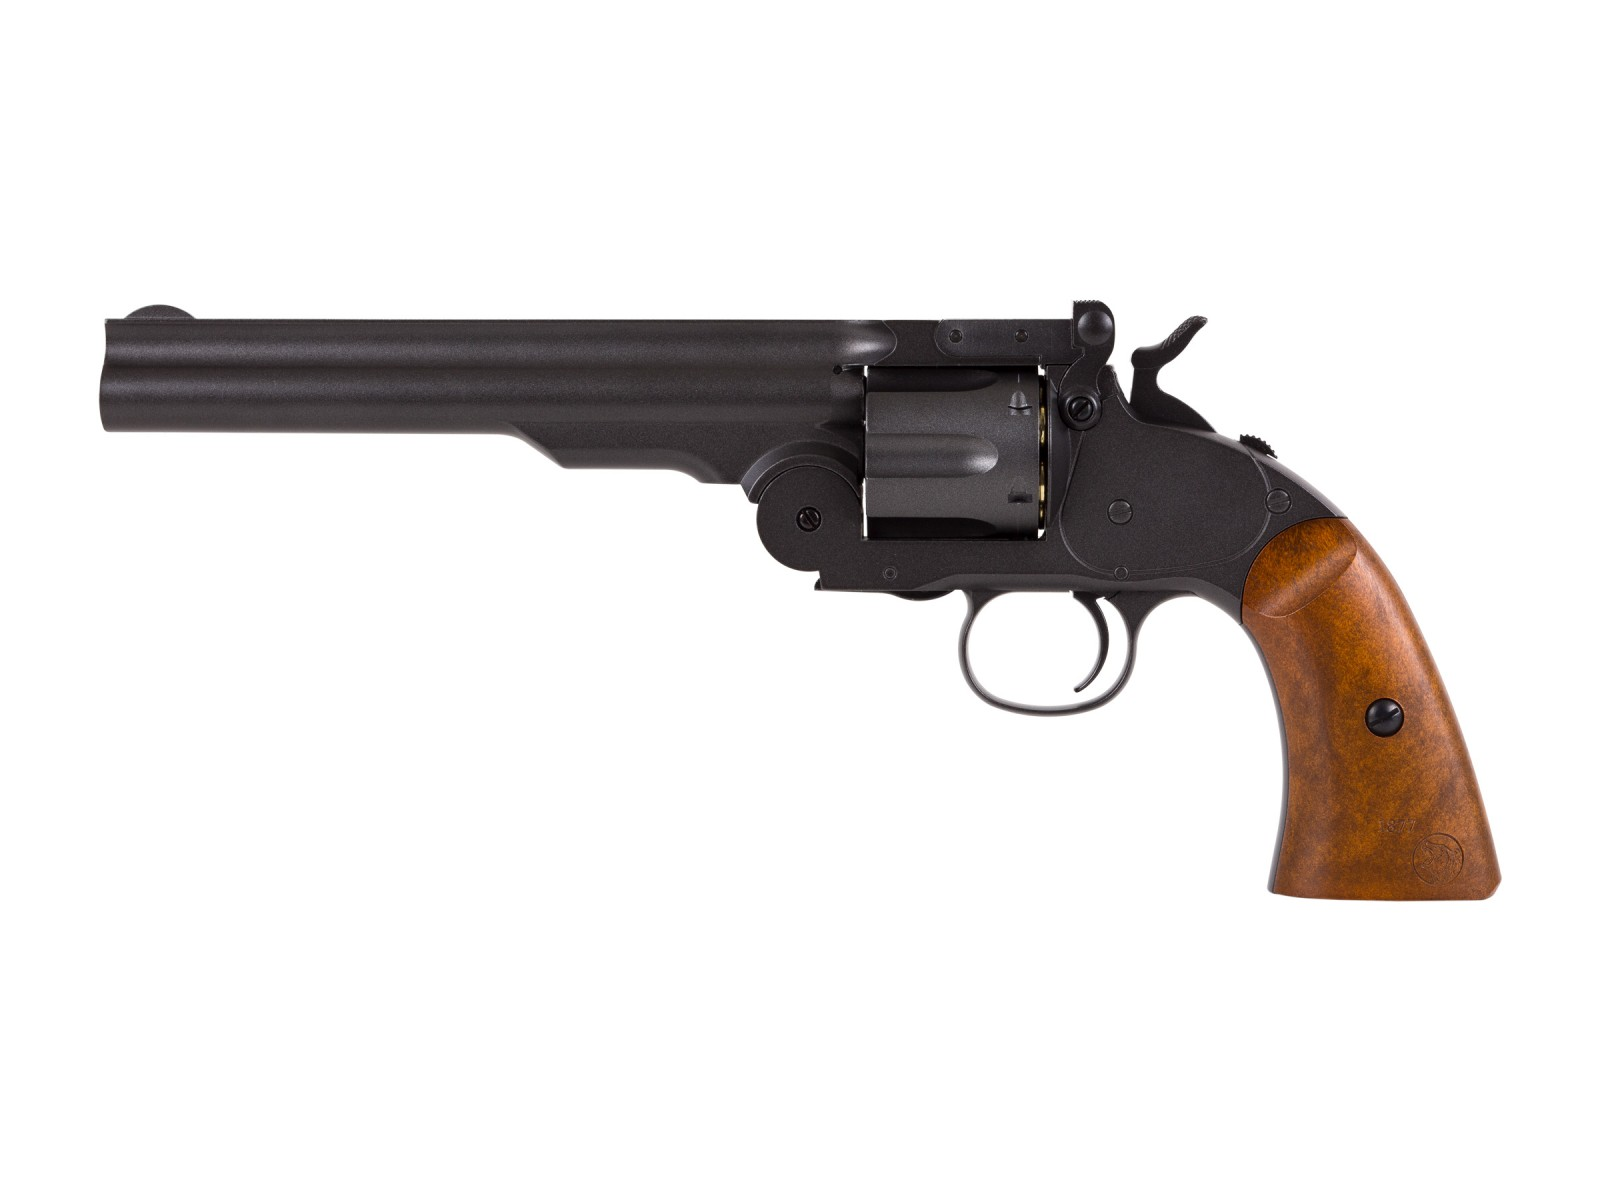 Cheap Schofield No. 3 CO2 BB Revolver, Full Metal 0.177